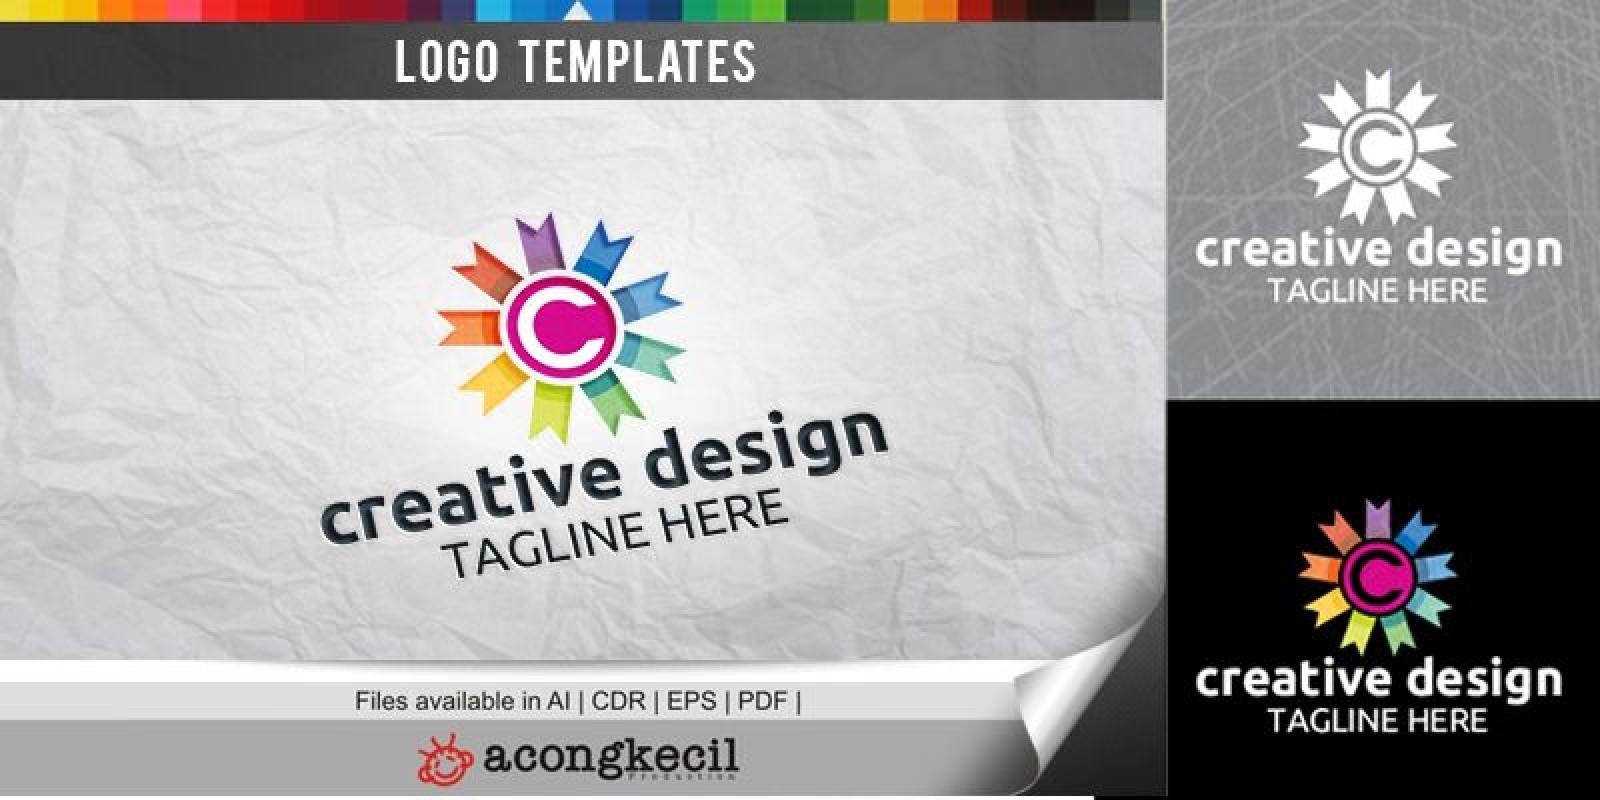 Creative Design - Logo Template